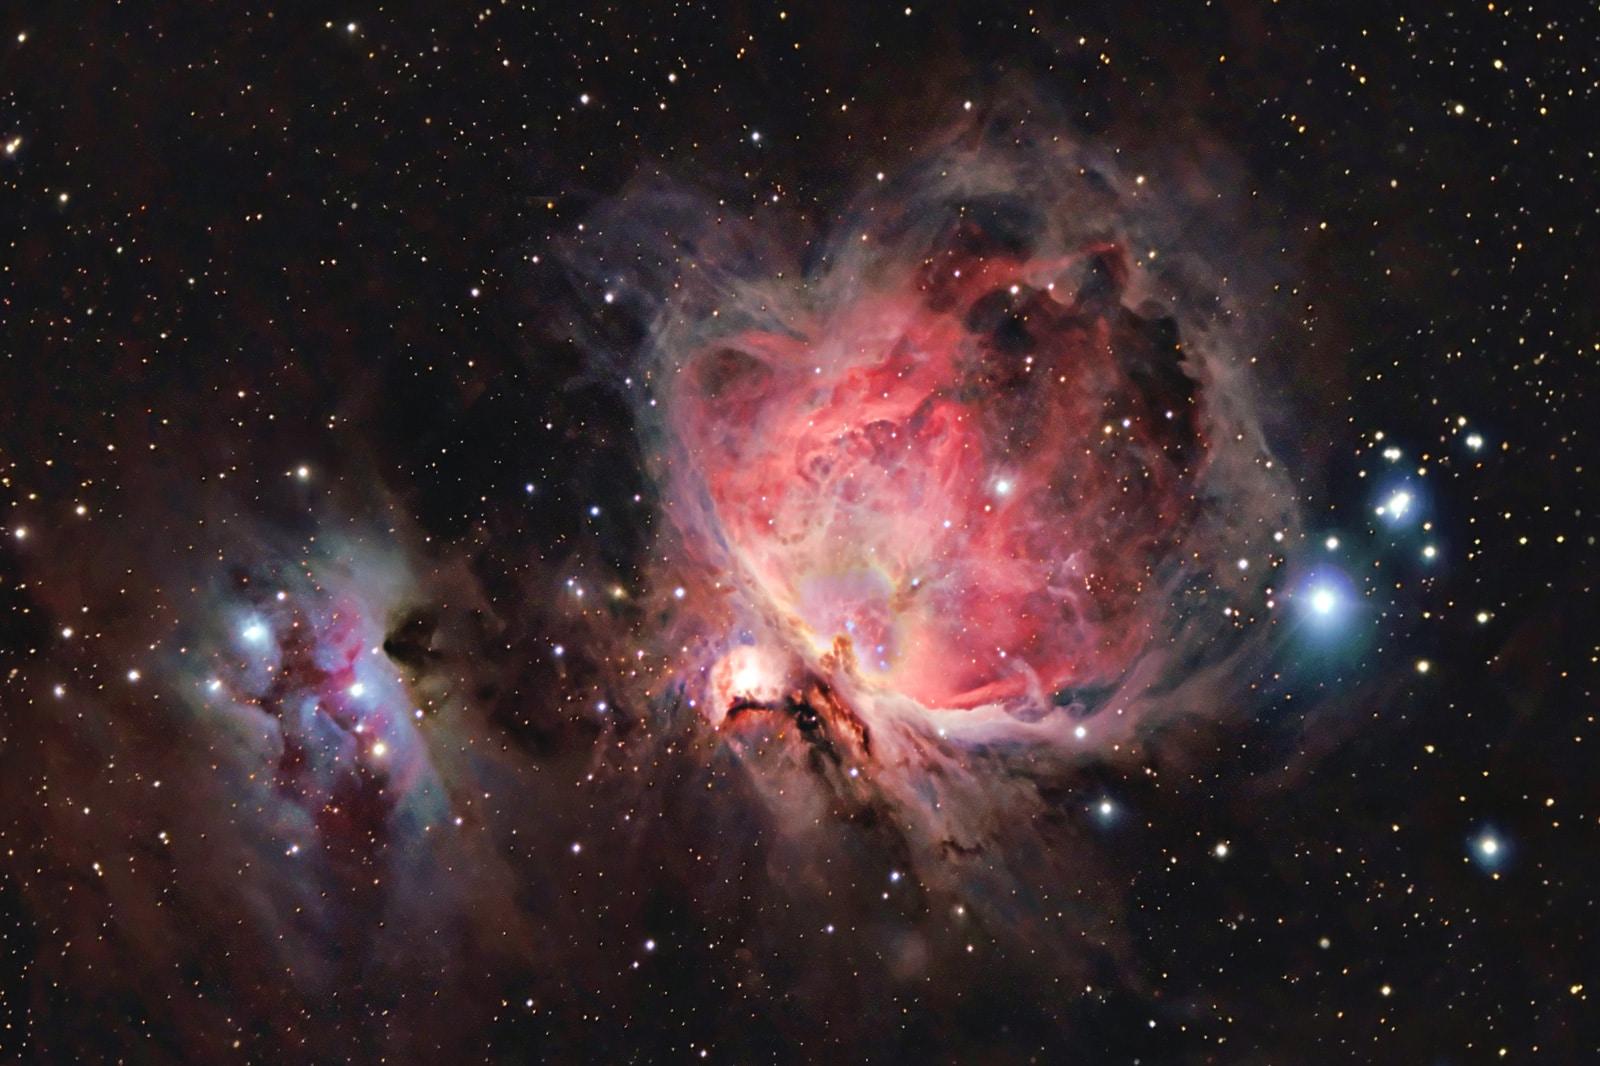 M42 The Orion Nebula - Shawn Nielsen 2010